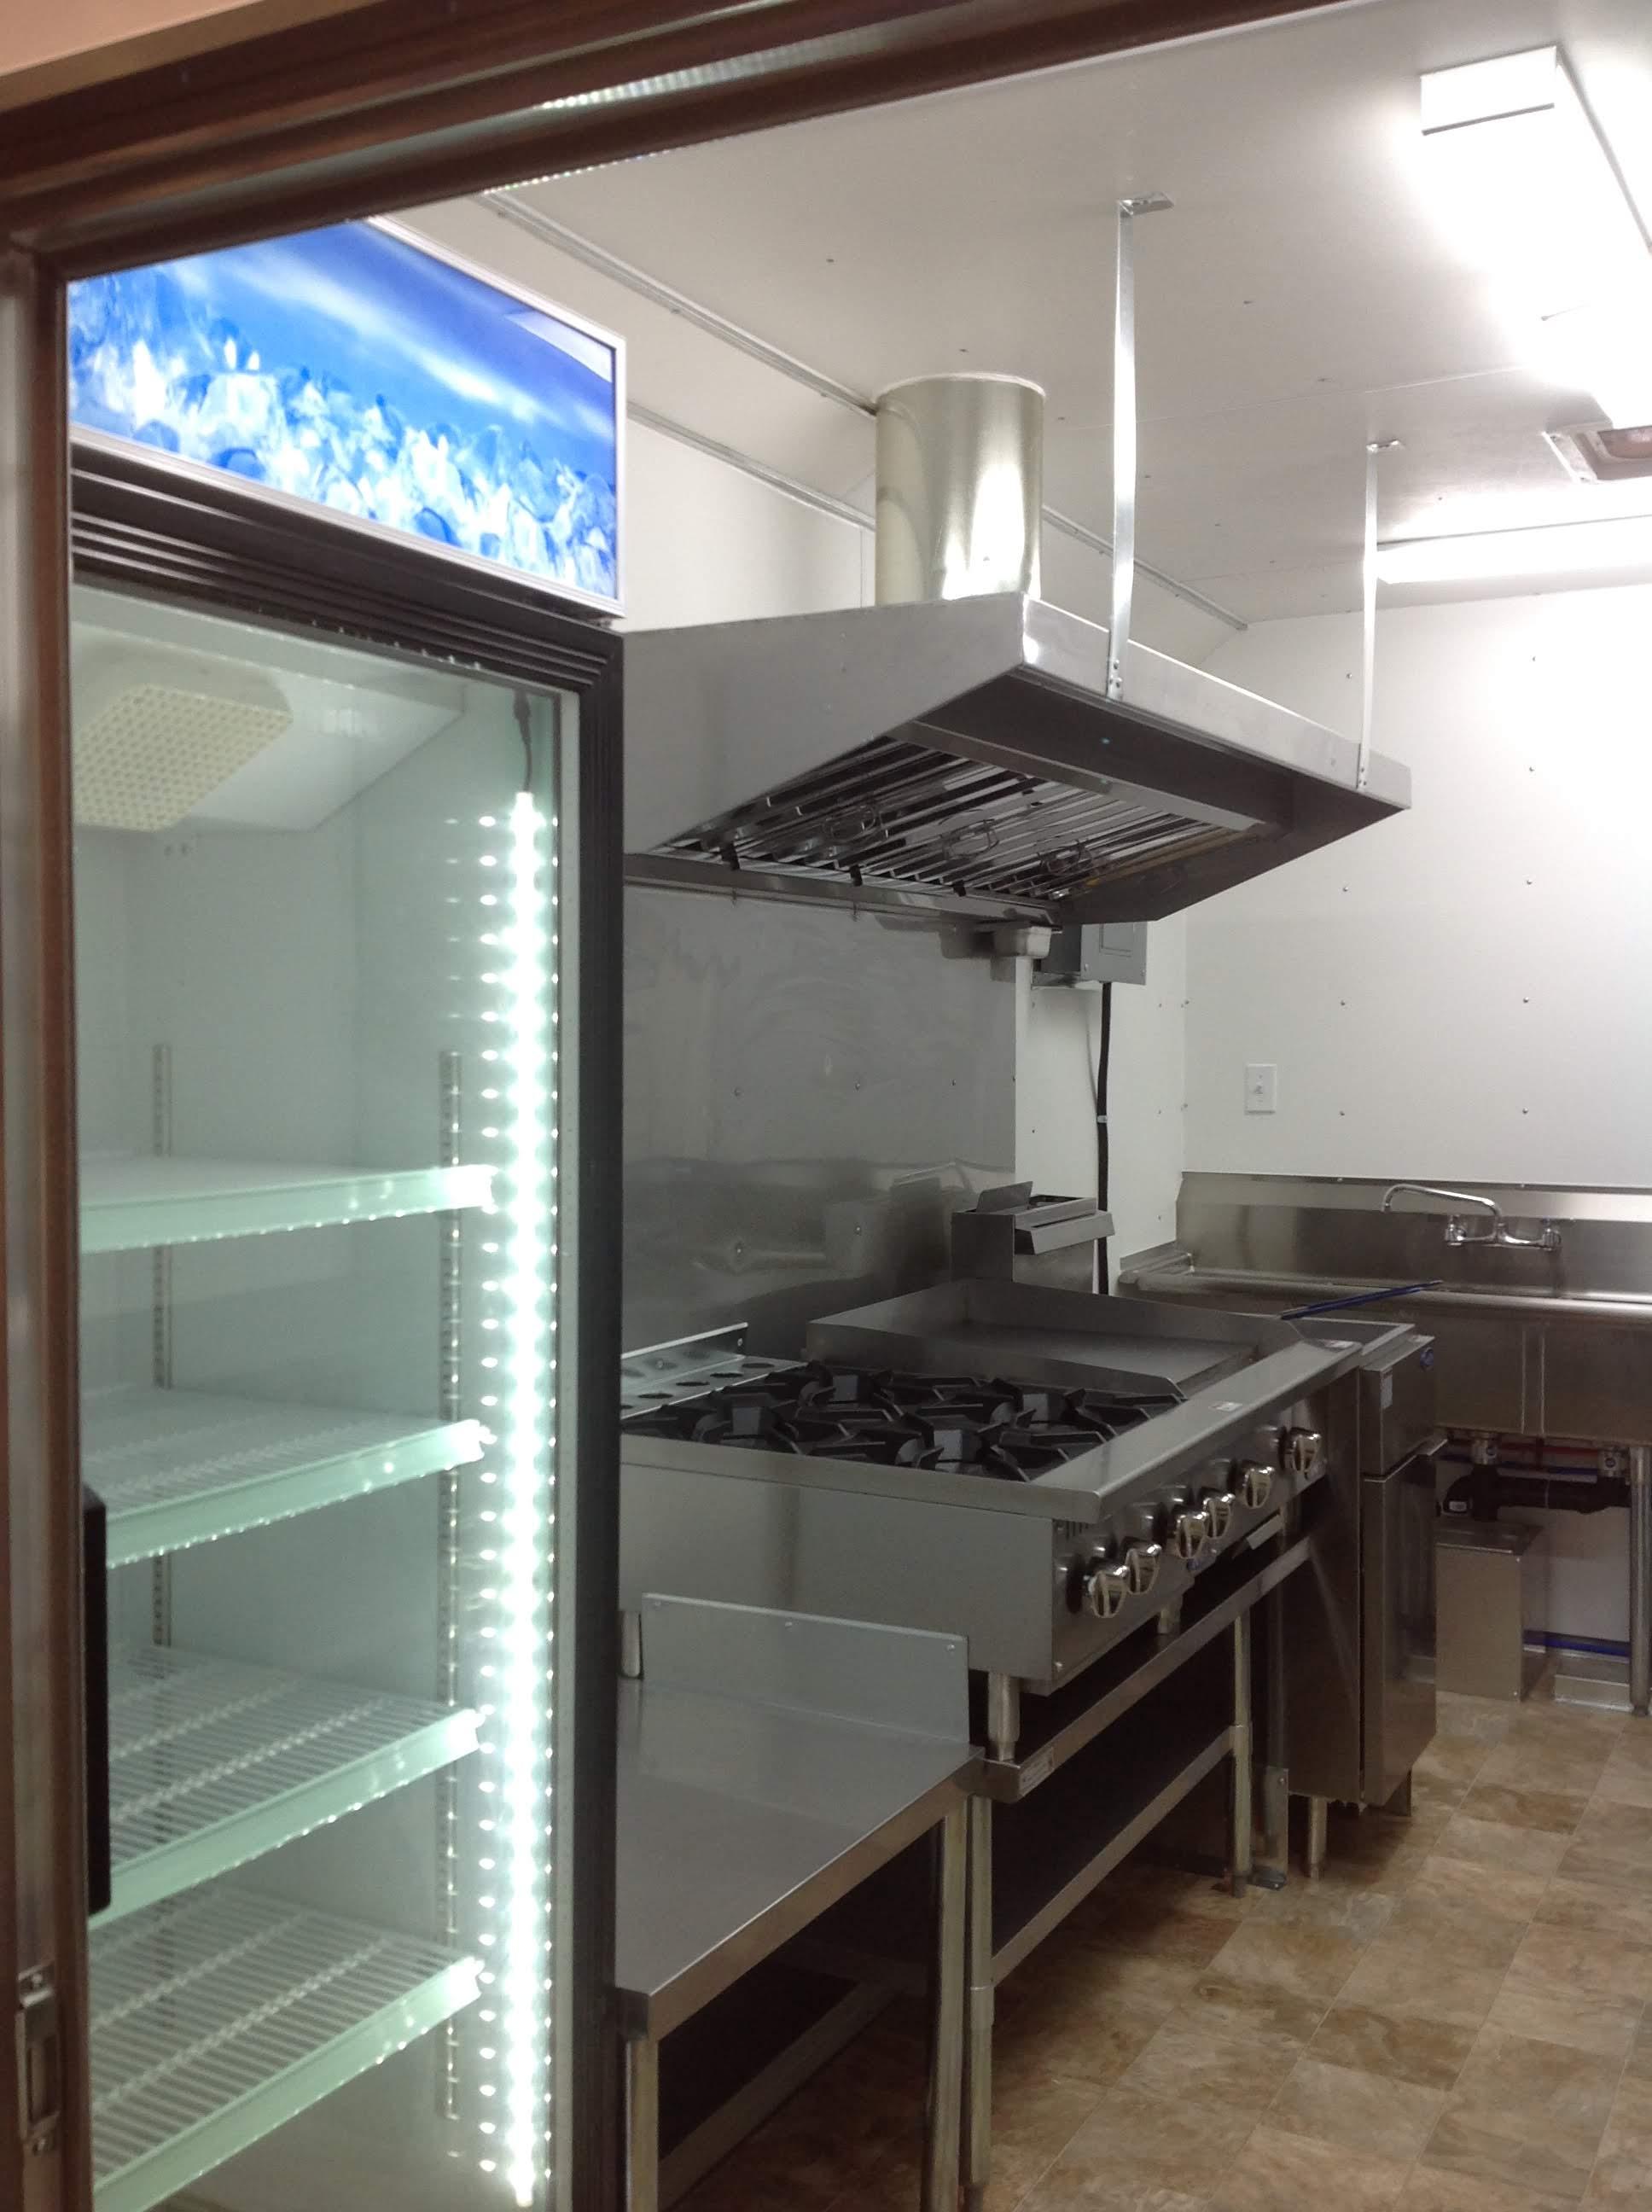 Trailer 10 Custom Kitchen Foodtruck